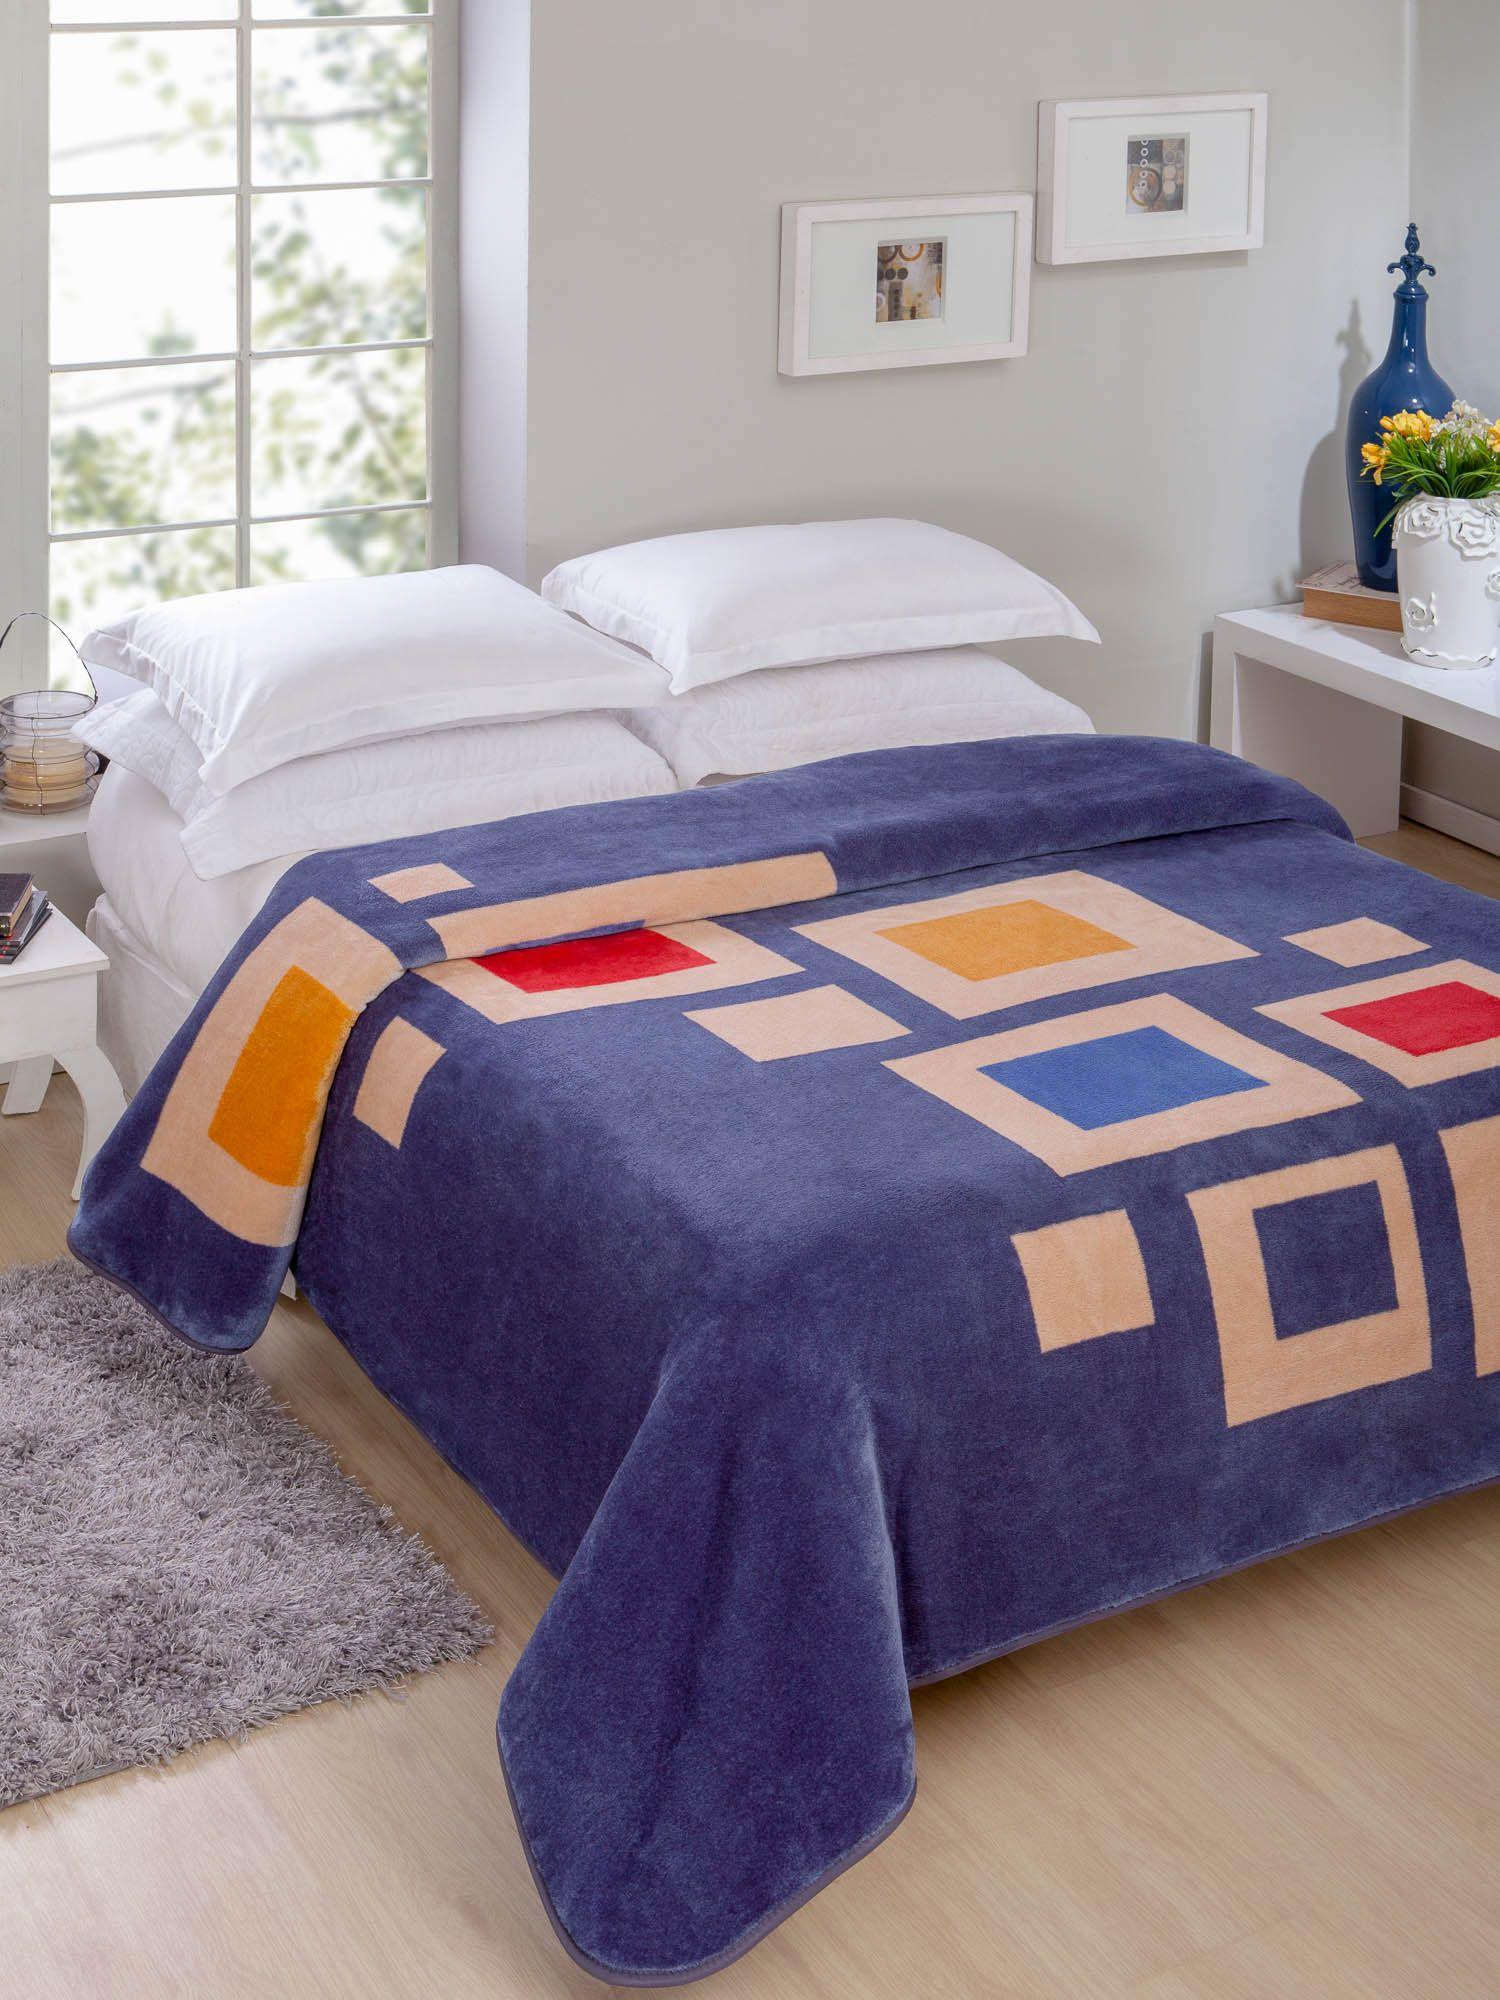 Cobertor Jolitex Raschel Casal 1,80x2,20m Dakota